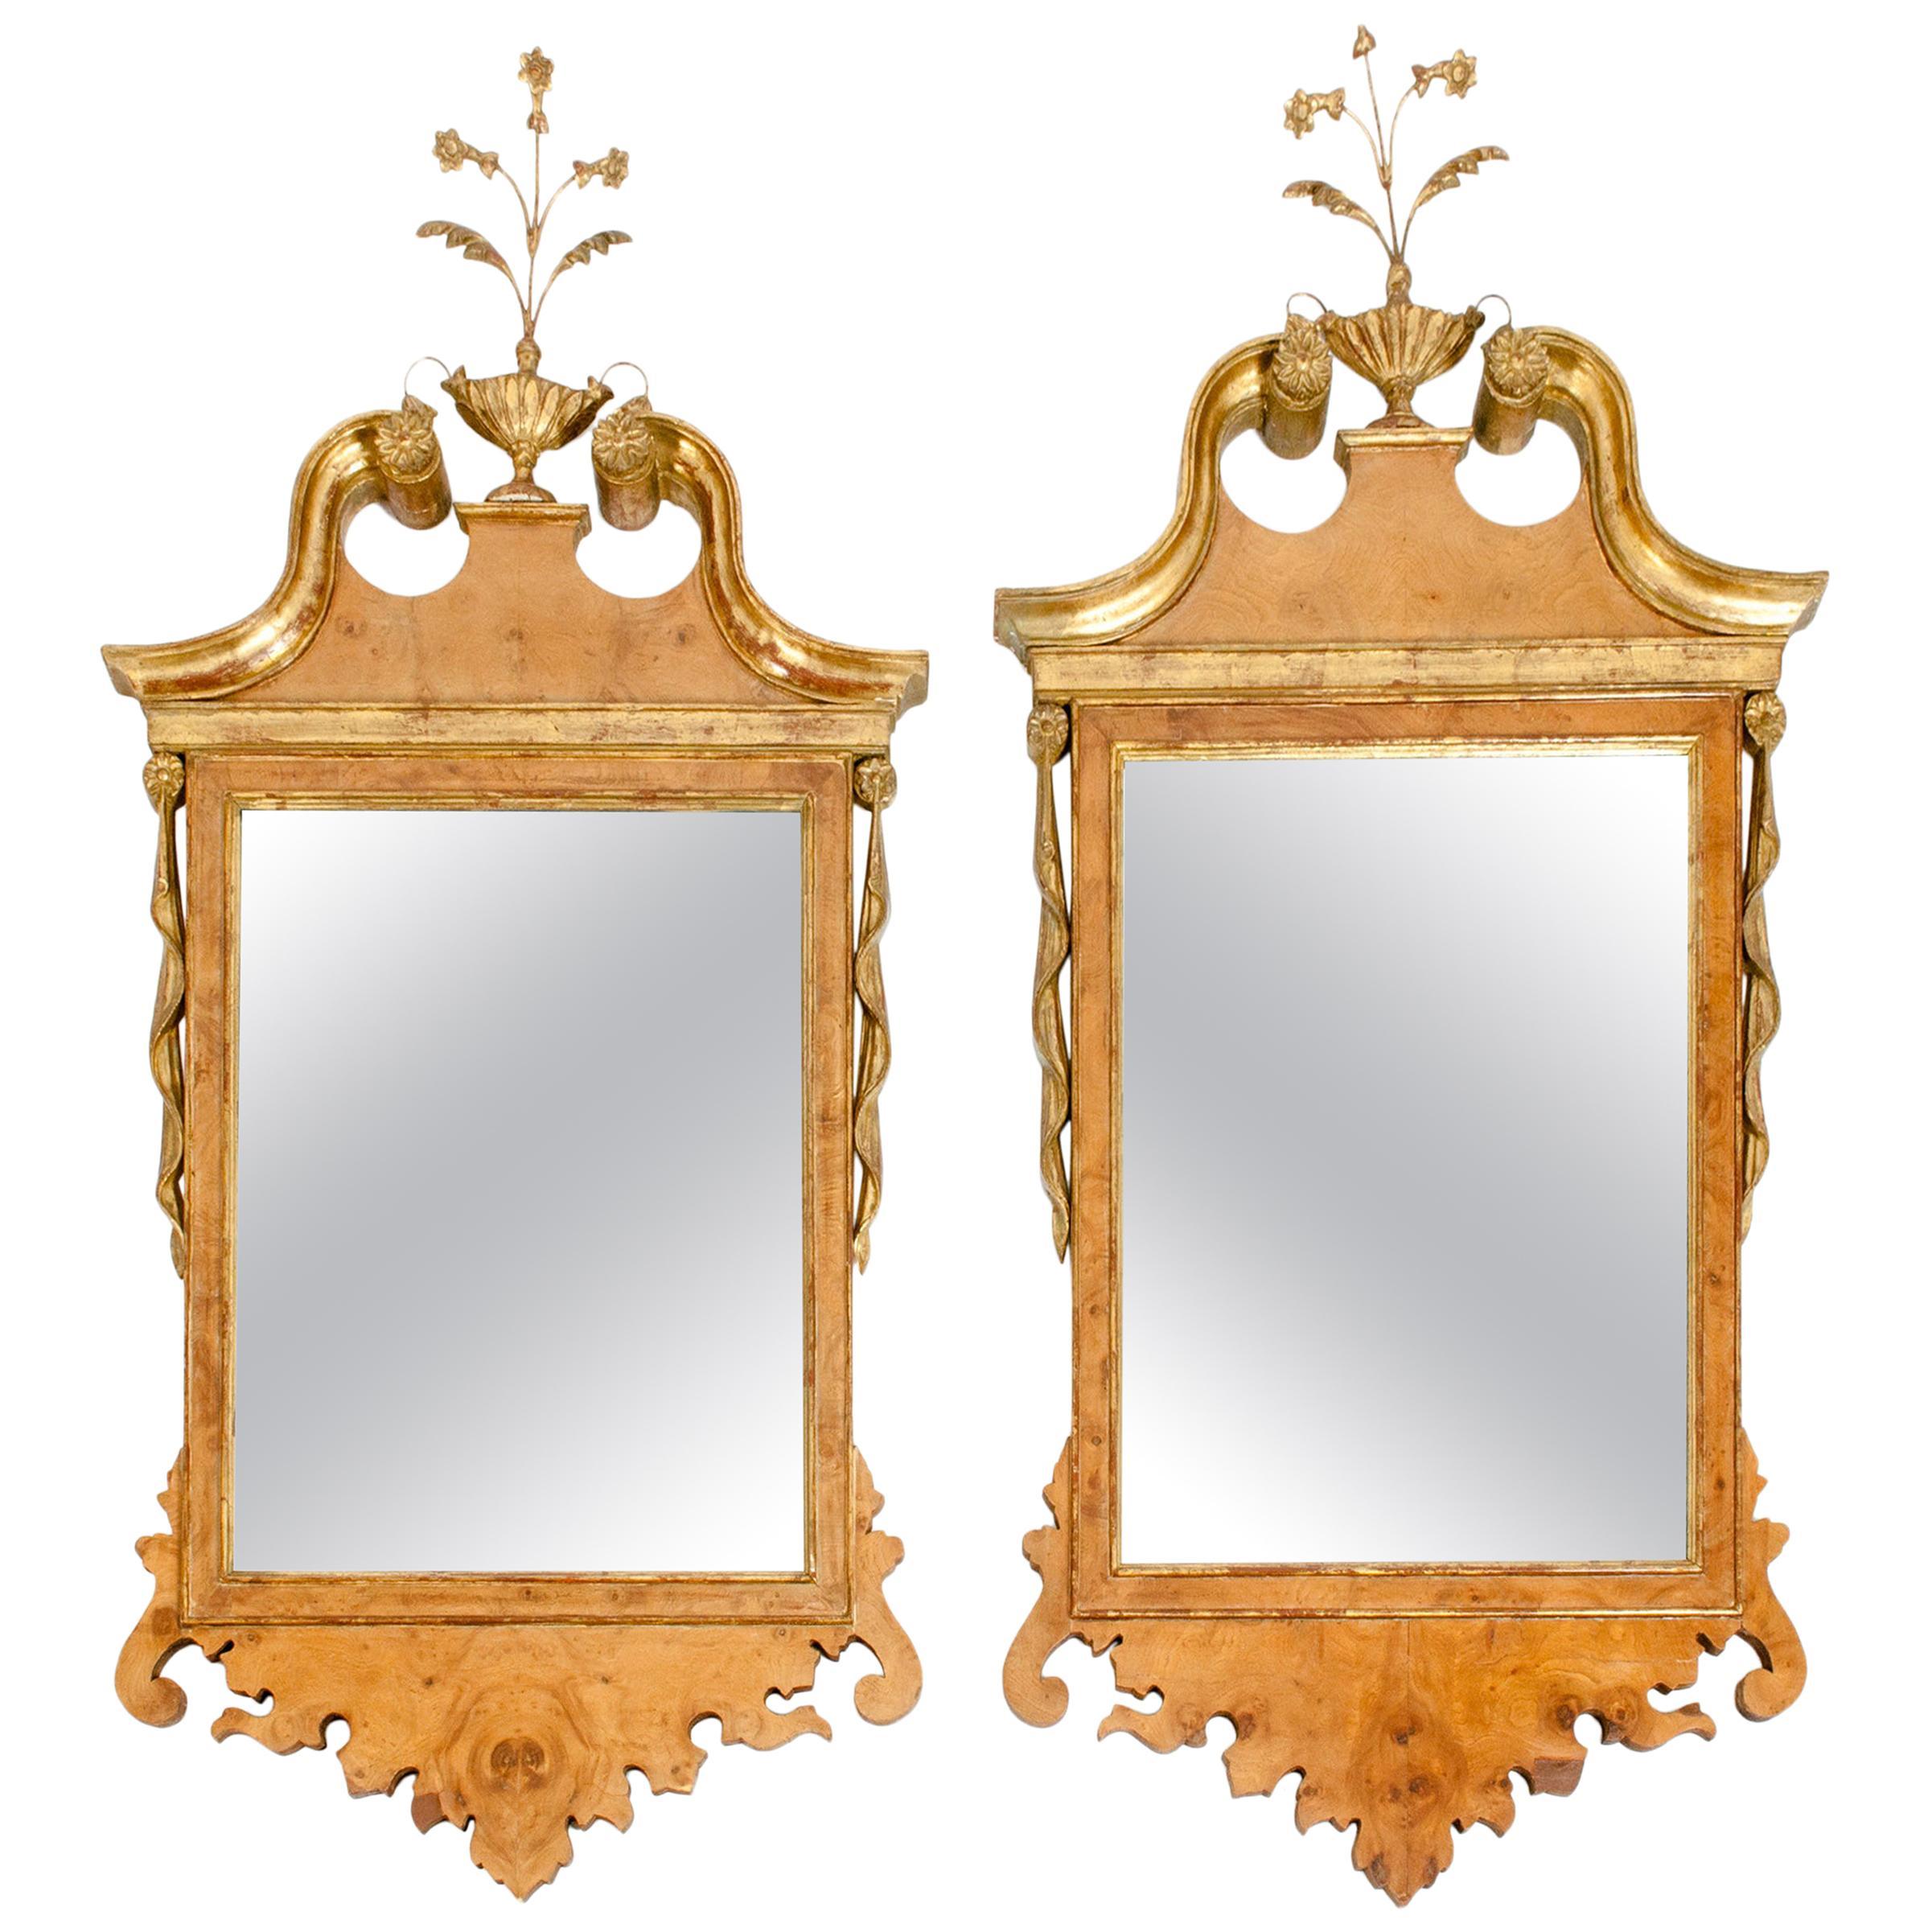 Burlwood / Gilt Gold Frame Pair of Beveled Hanging Wall Mirror